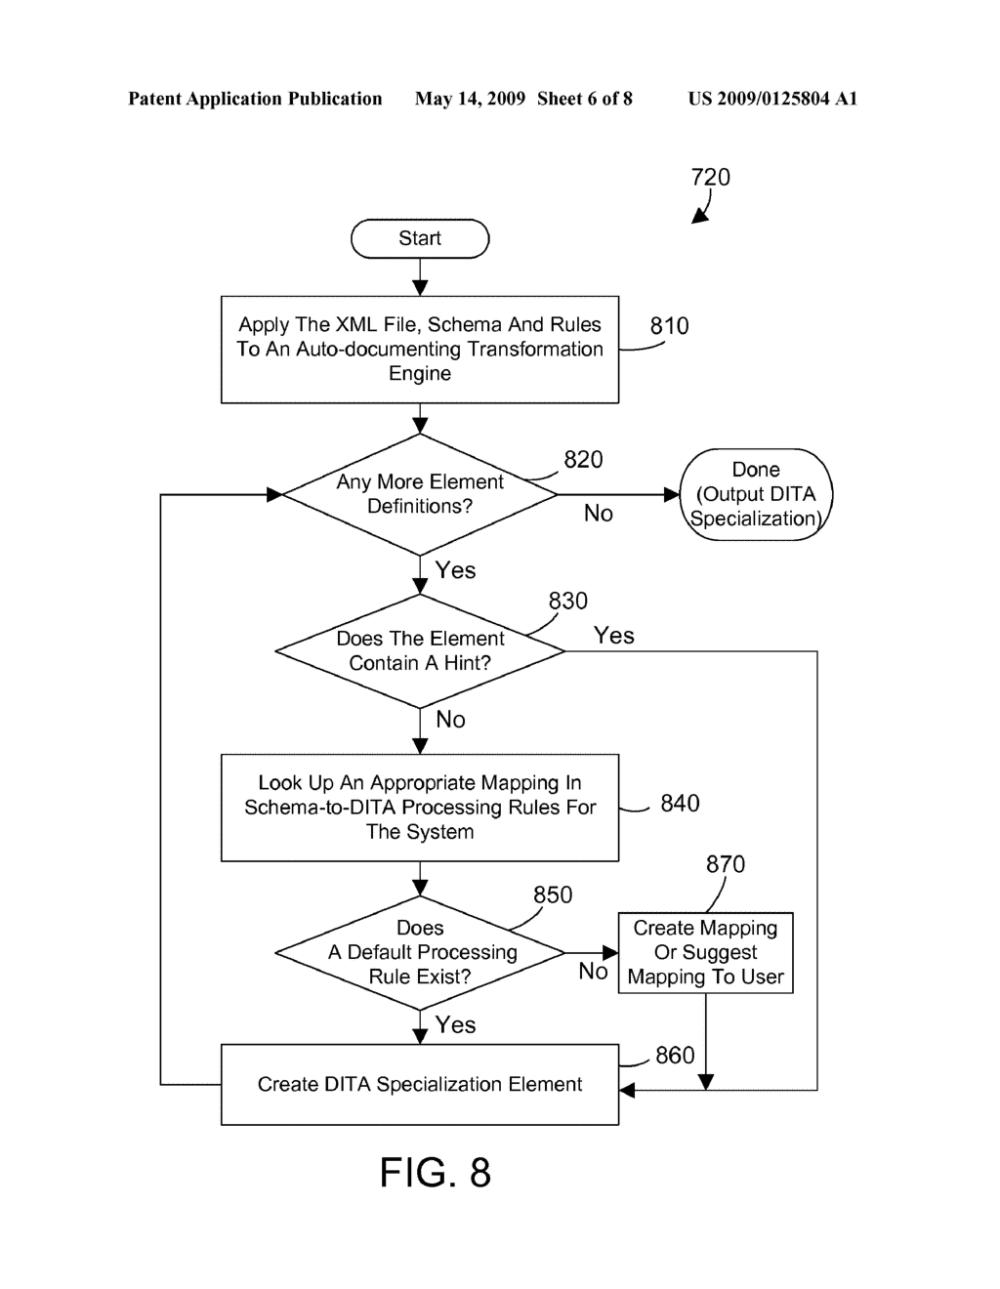 medium resolution of generating schema specific dita specializations during generic schema transformations diagram schematic and image 07